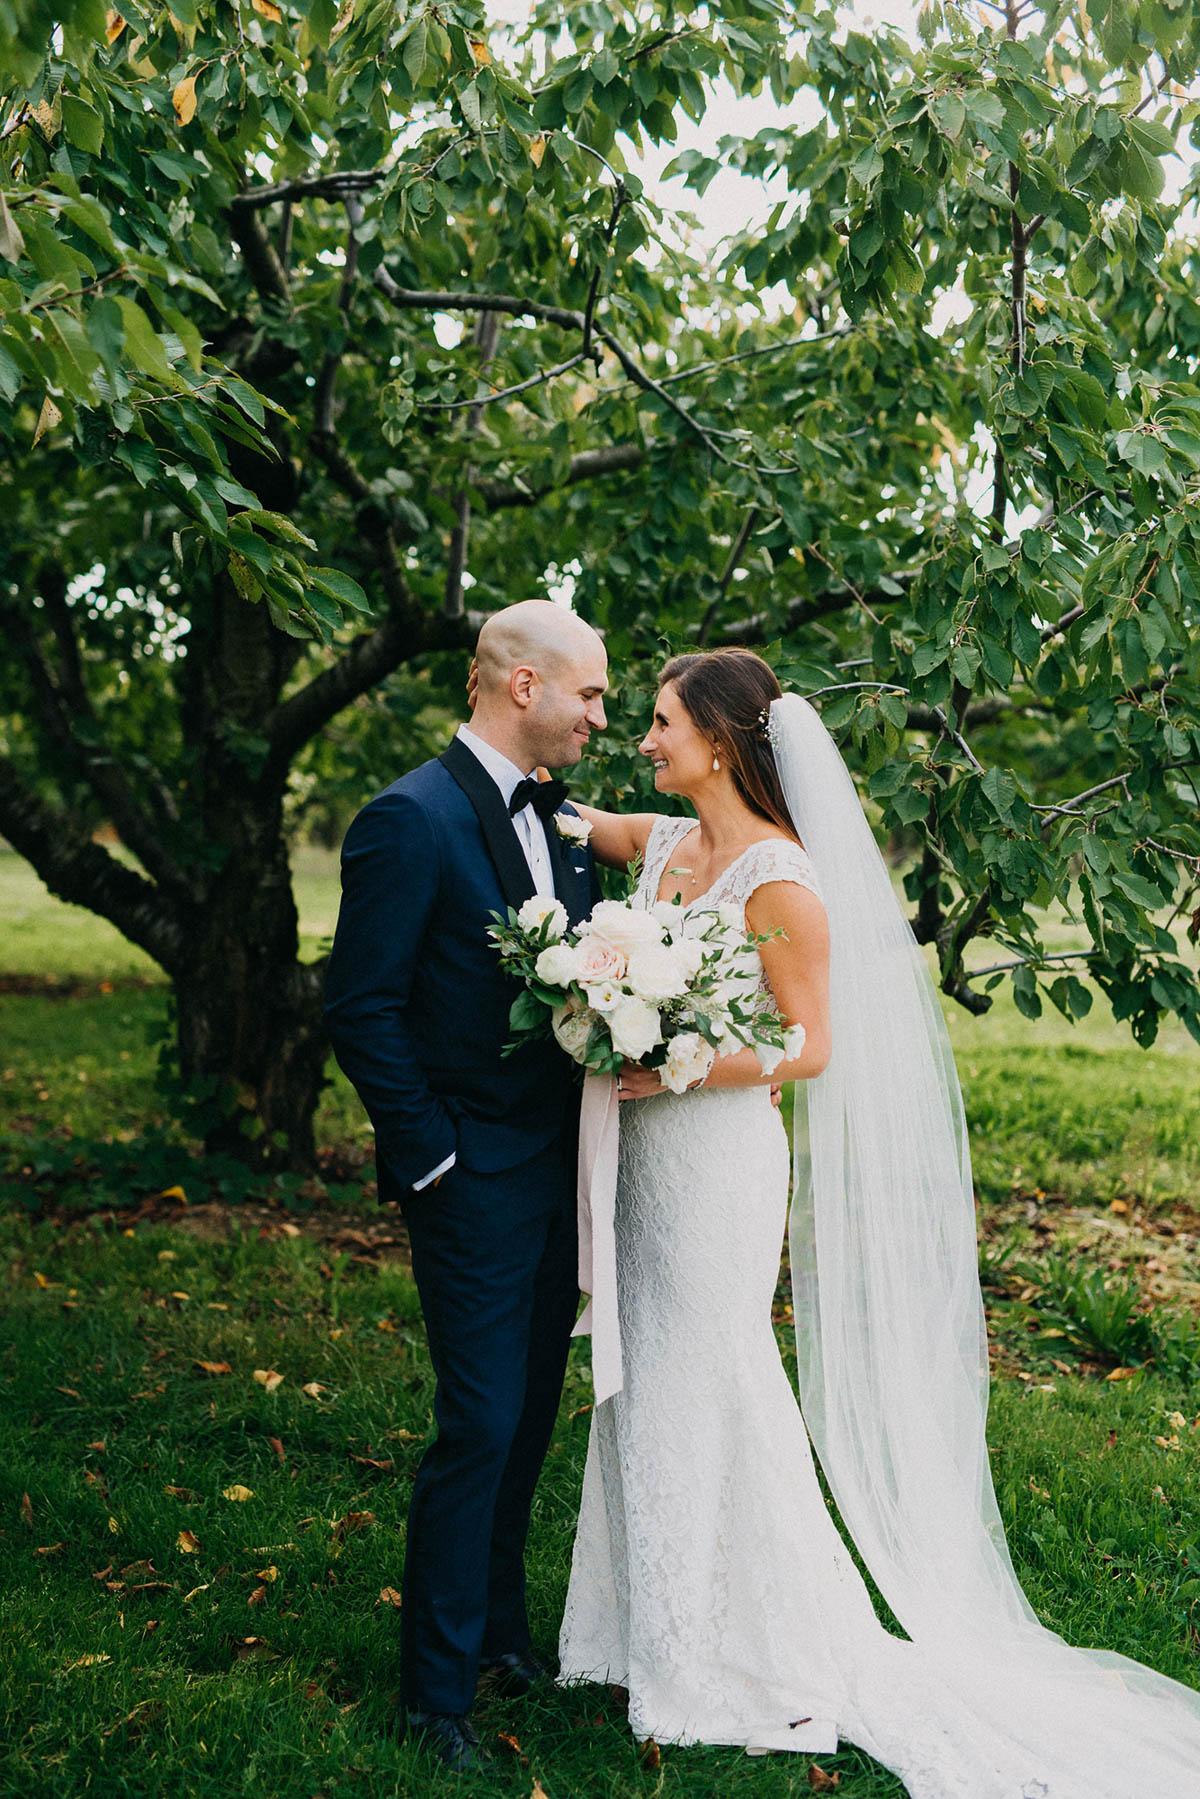 shaw-events-vineyard-bride-swish-list-kurtz-orchards-niagara-on-the-lake-wedding-36.jpg